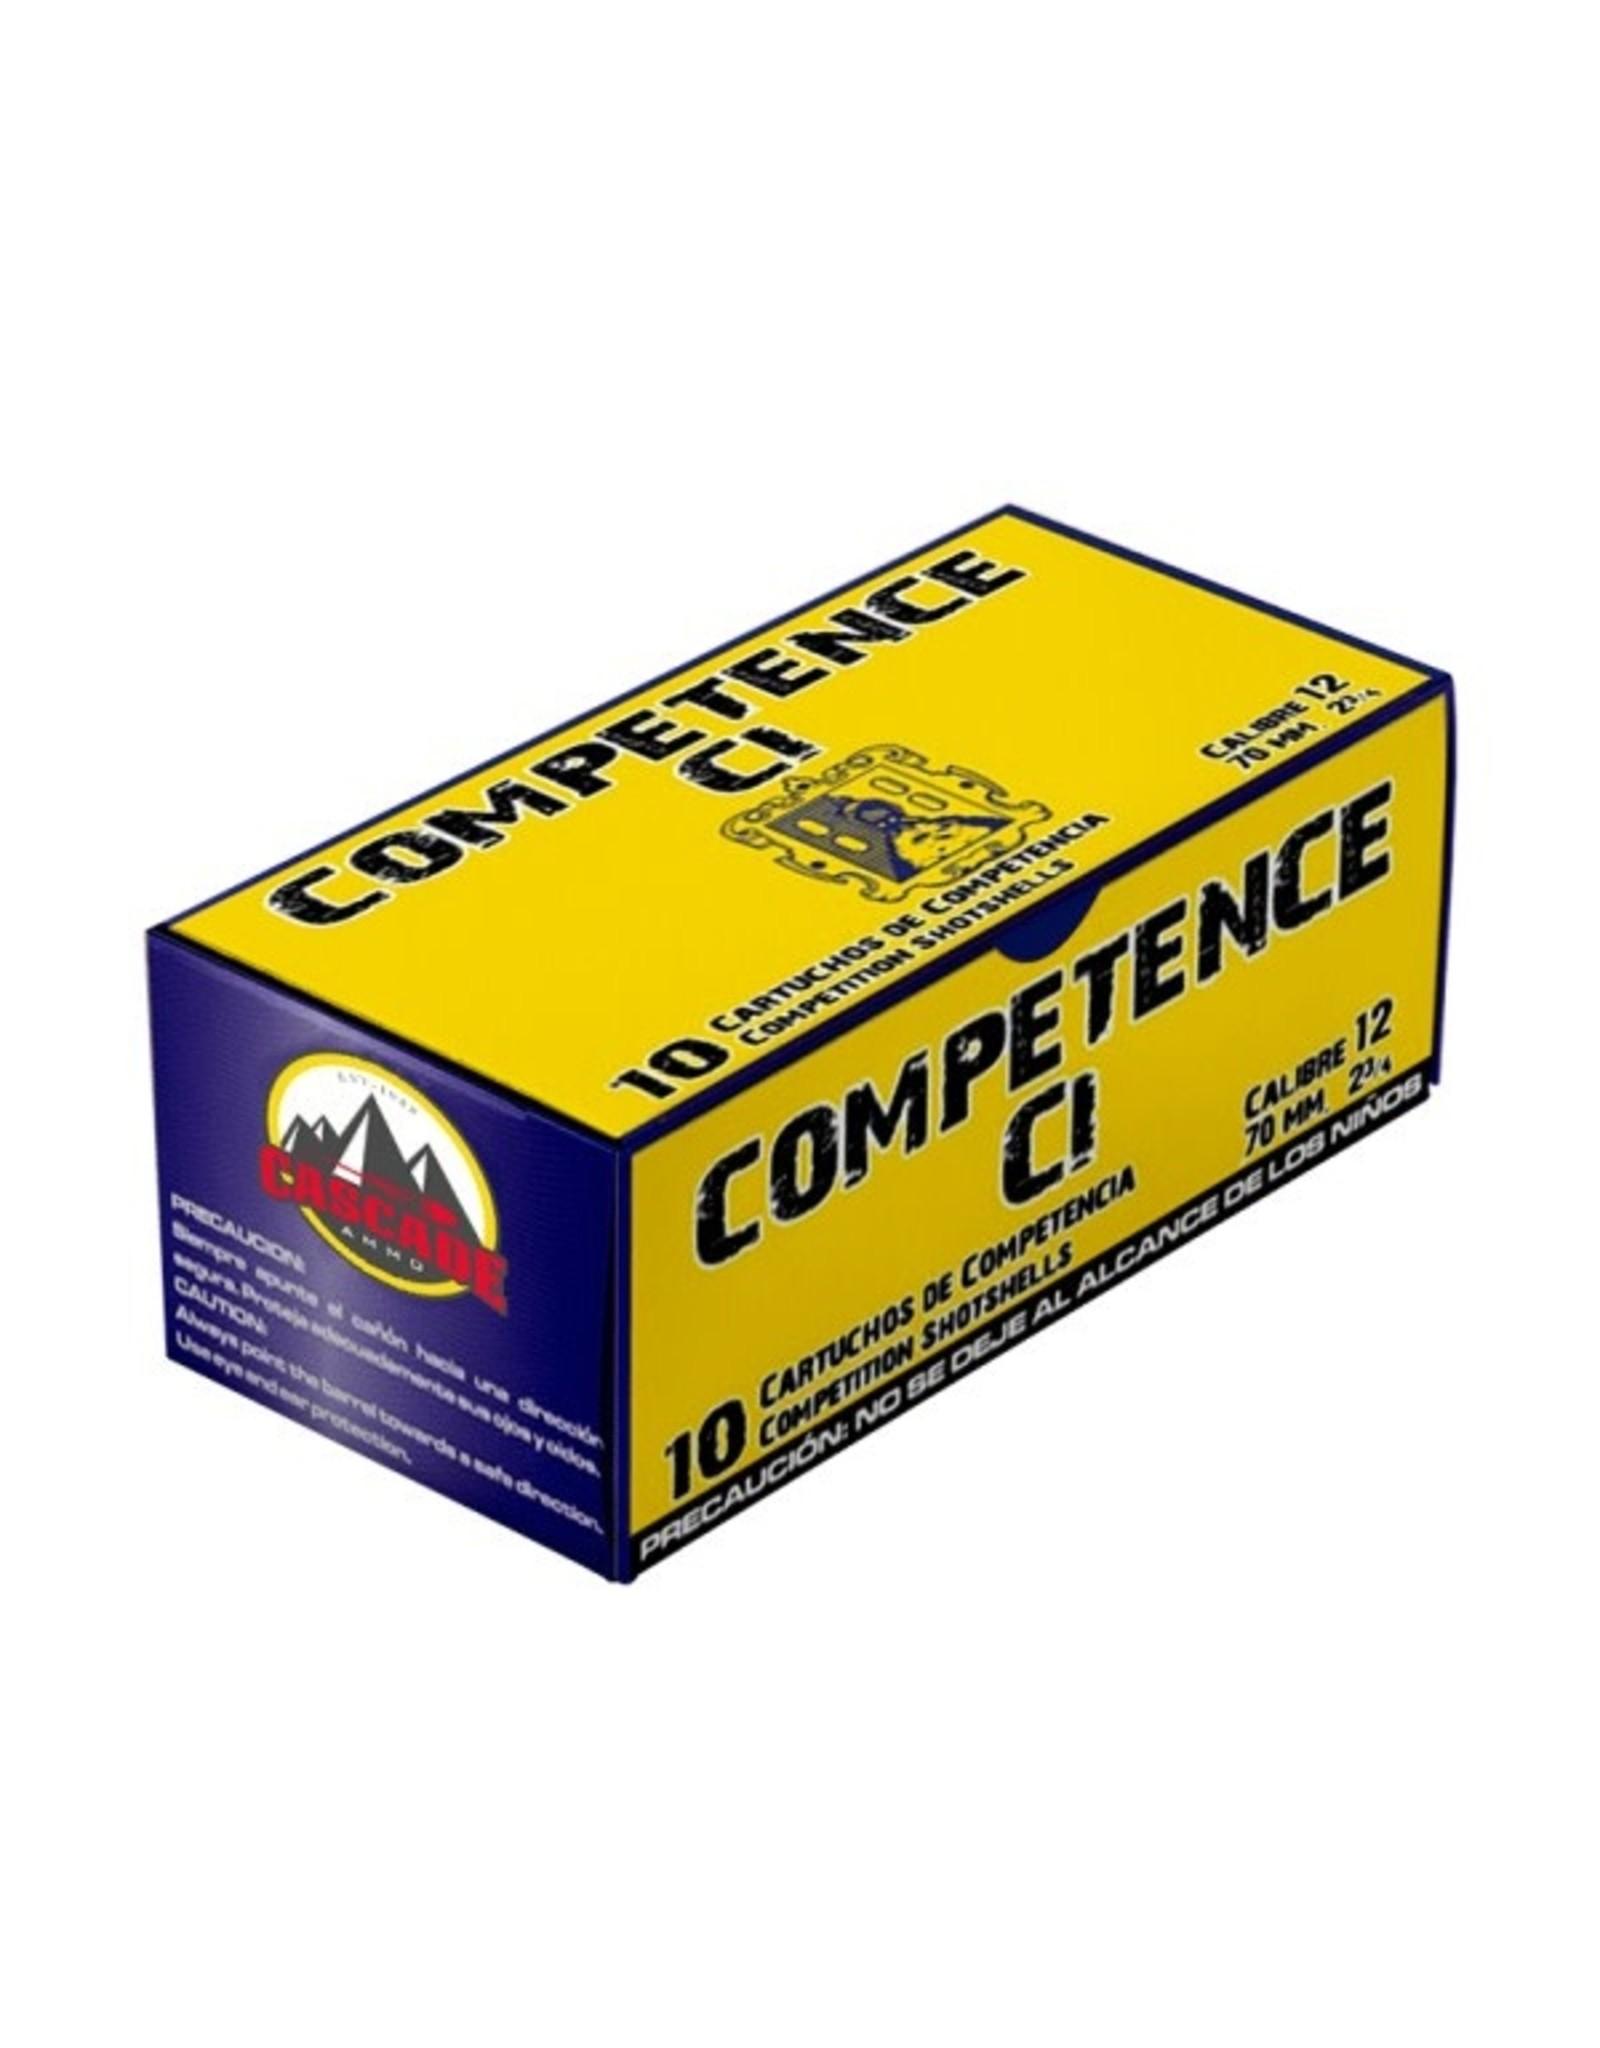 "Cascade Ammo Cascade - 12ga Competence 2-3/4"" 1-1/4oz - #8 - 10ct"